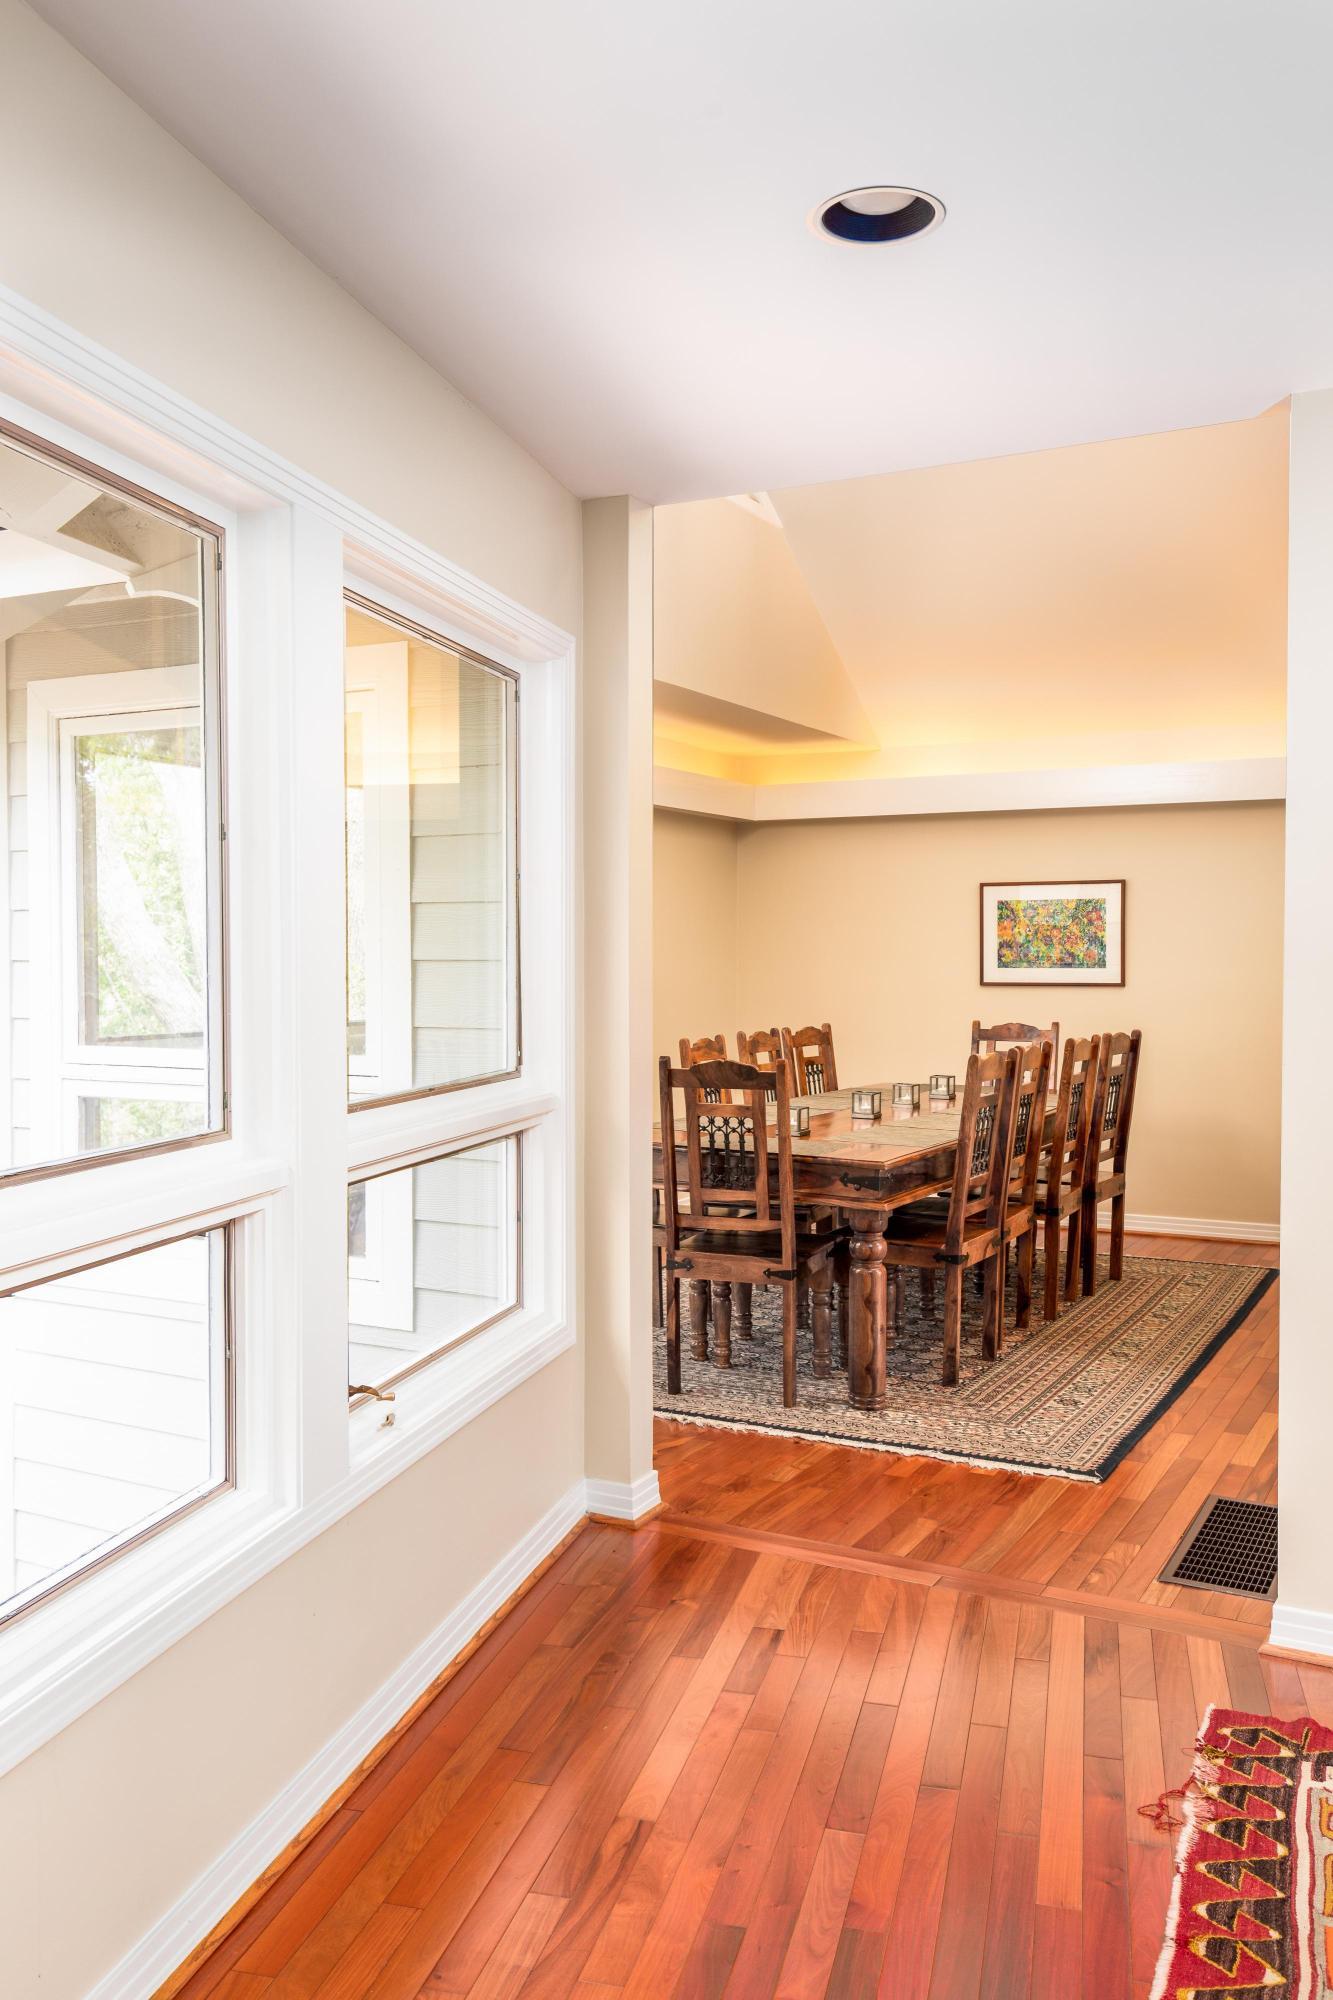 Seabrook Island Homes For Sale - 3011 Marsh Haven, Seabrook Island, SC - 61